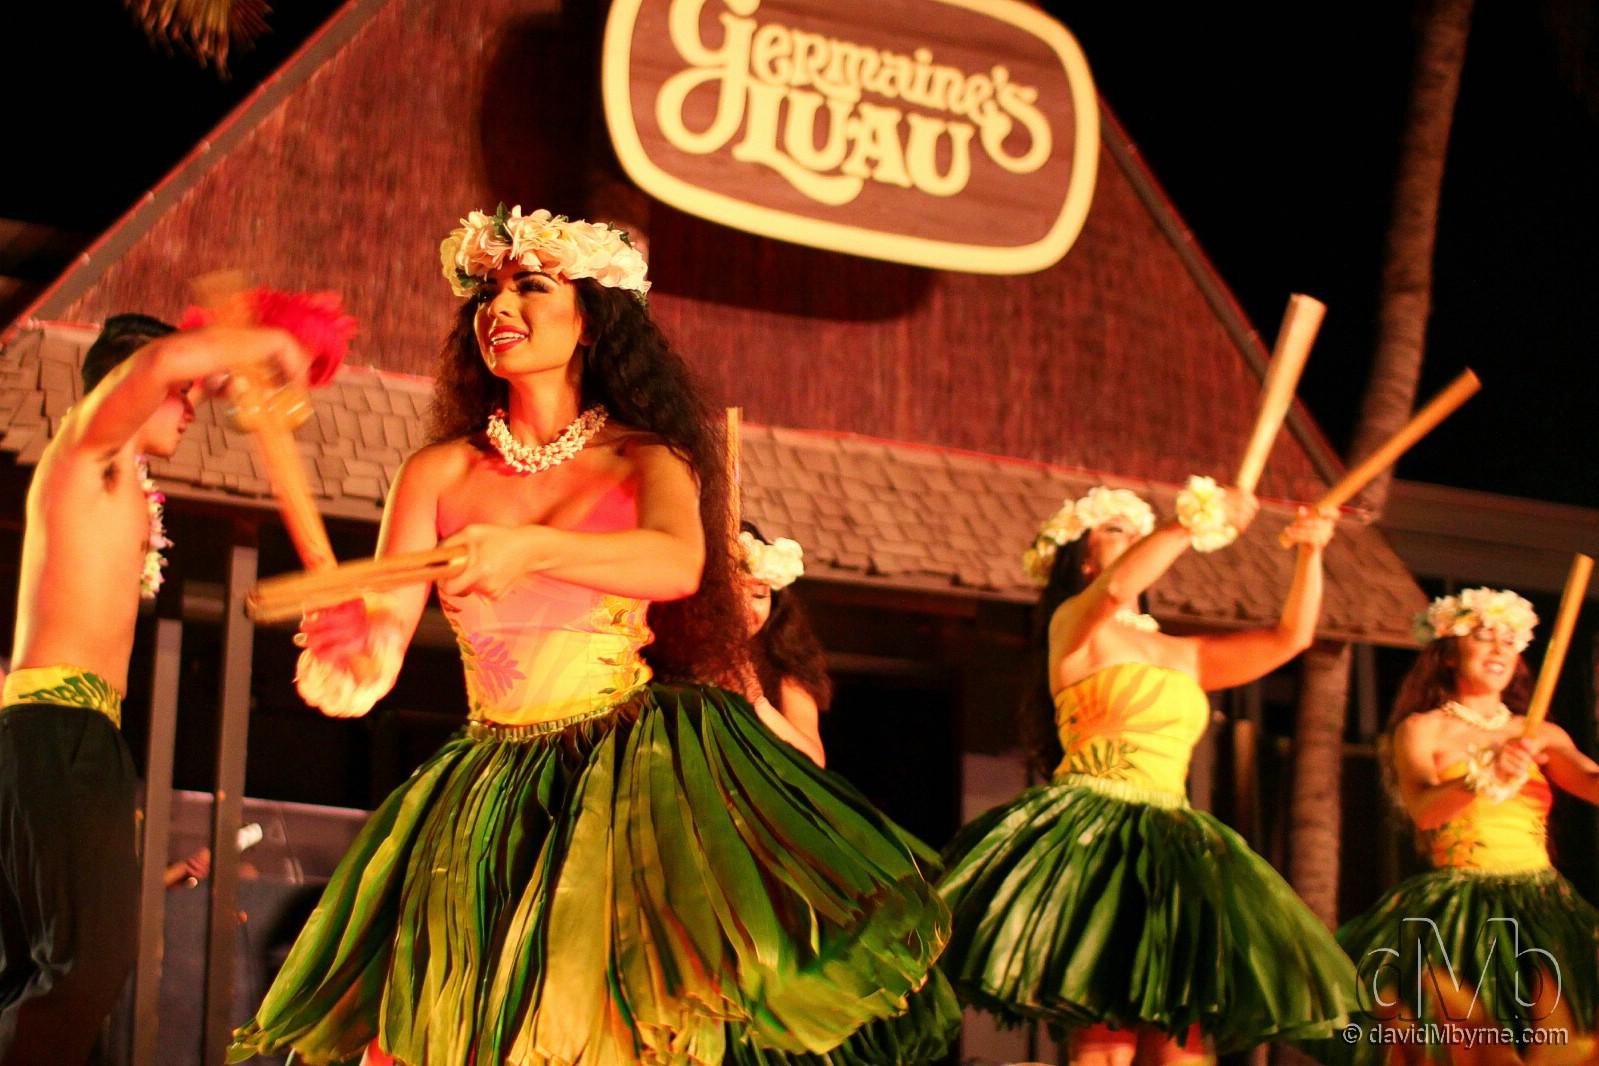 Kane (men) & wahine (women) dancers at Germaine's Luau, Oahu, Hawaii, USA. February 27th 2013 (EOS 60D || Sigma 30mm f/1.4 || 30mm, 1/100sec, f/1.4, iso1250)